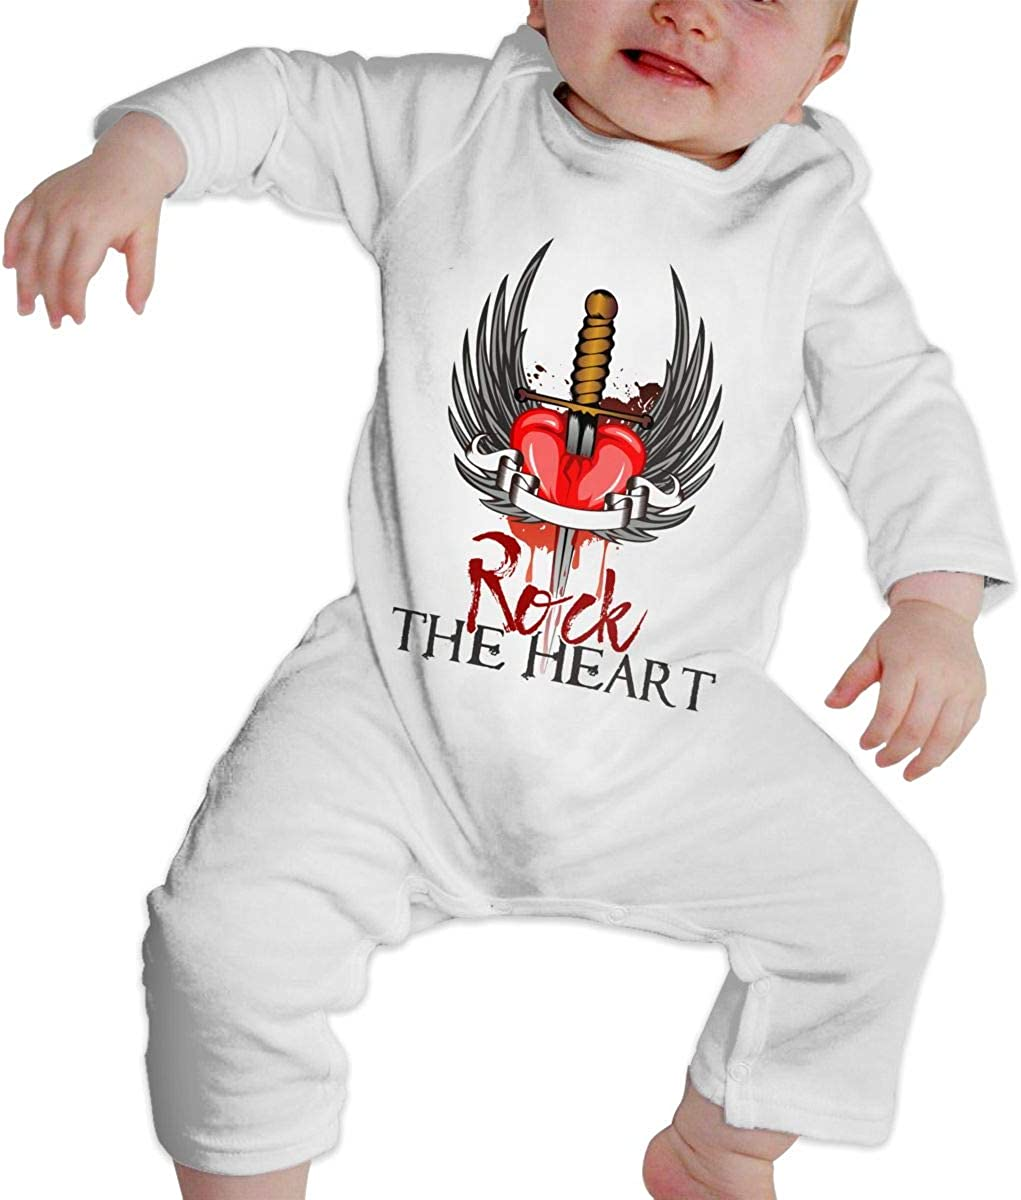 Heart Rock Band Boys//Girls Baby Cotton Long Sleeve Romper Warm Bodysuit